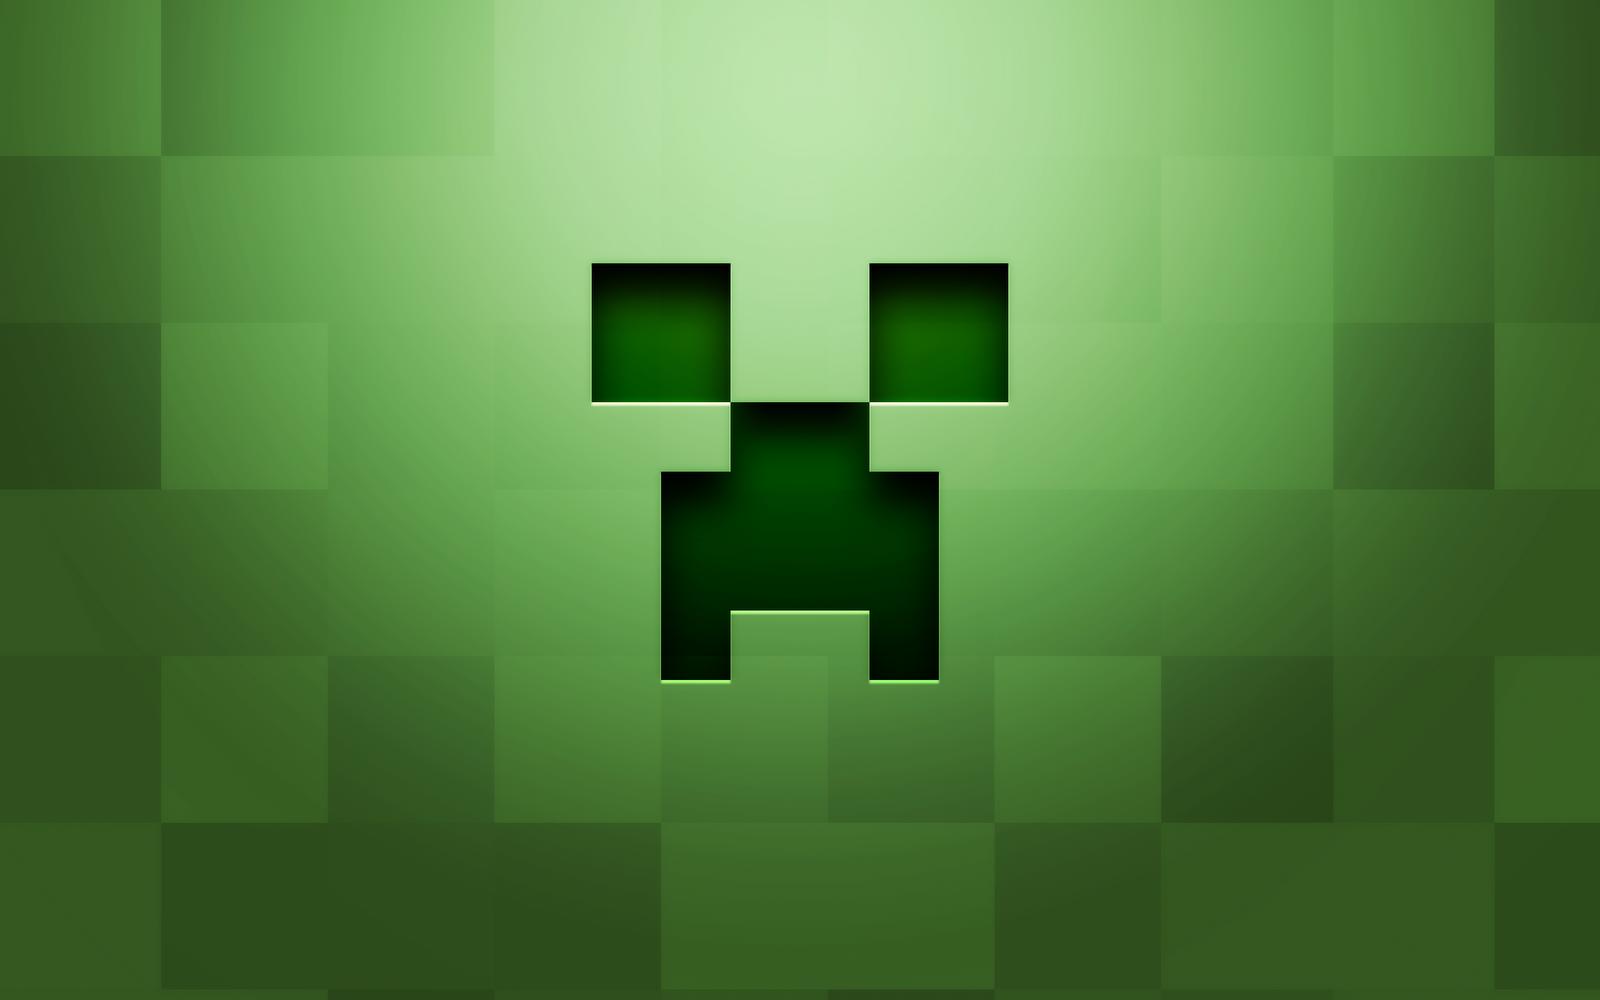 Minecraft in the LMC